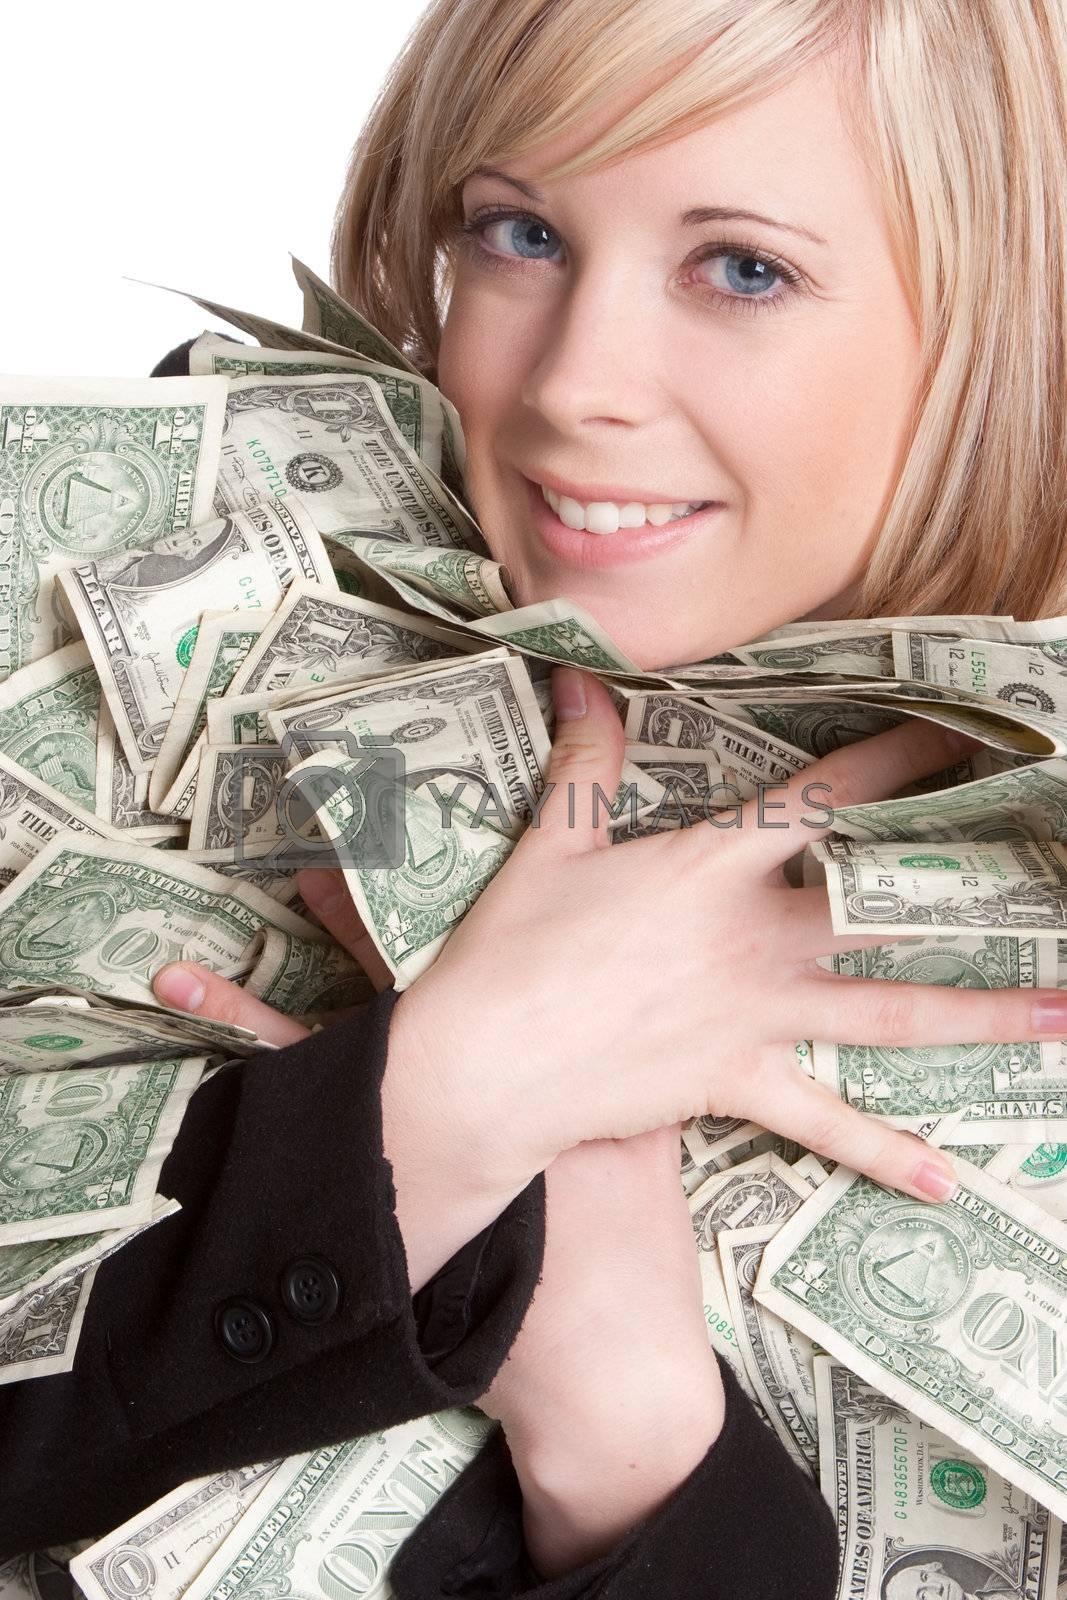 Smiling beautiful woman holding money